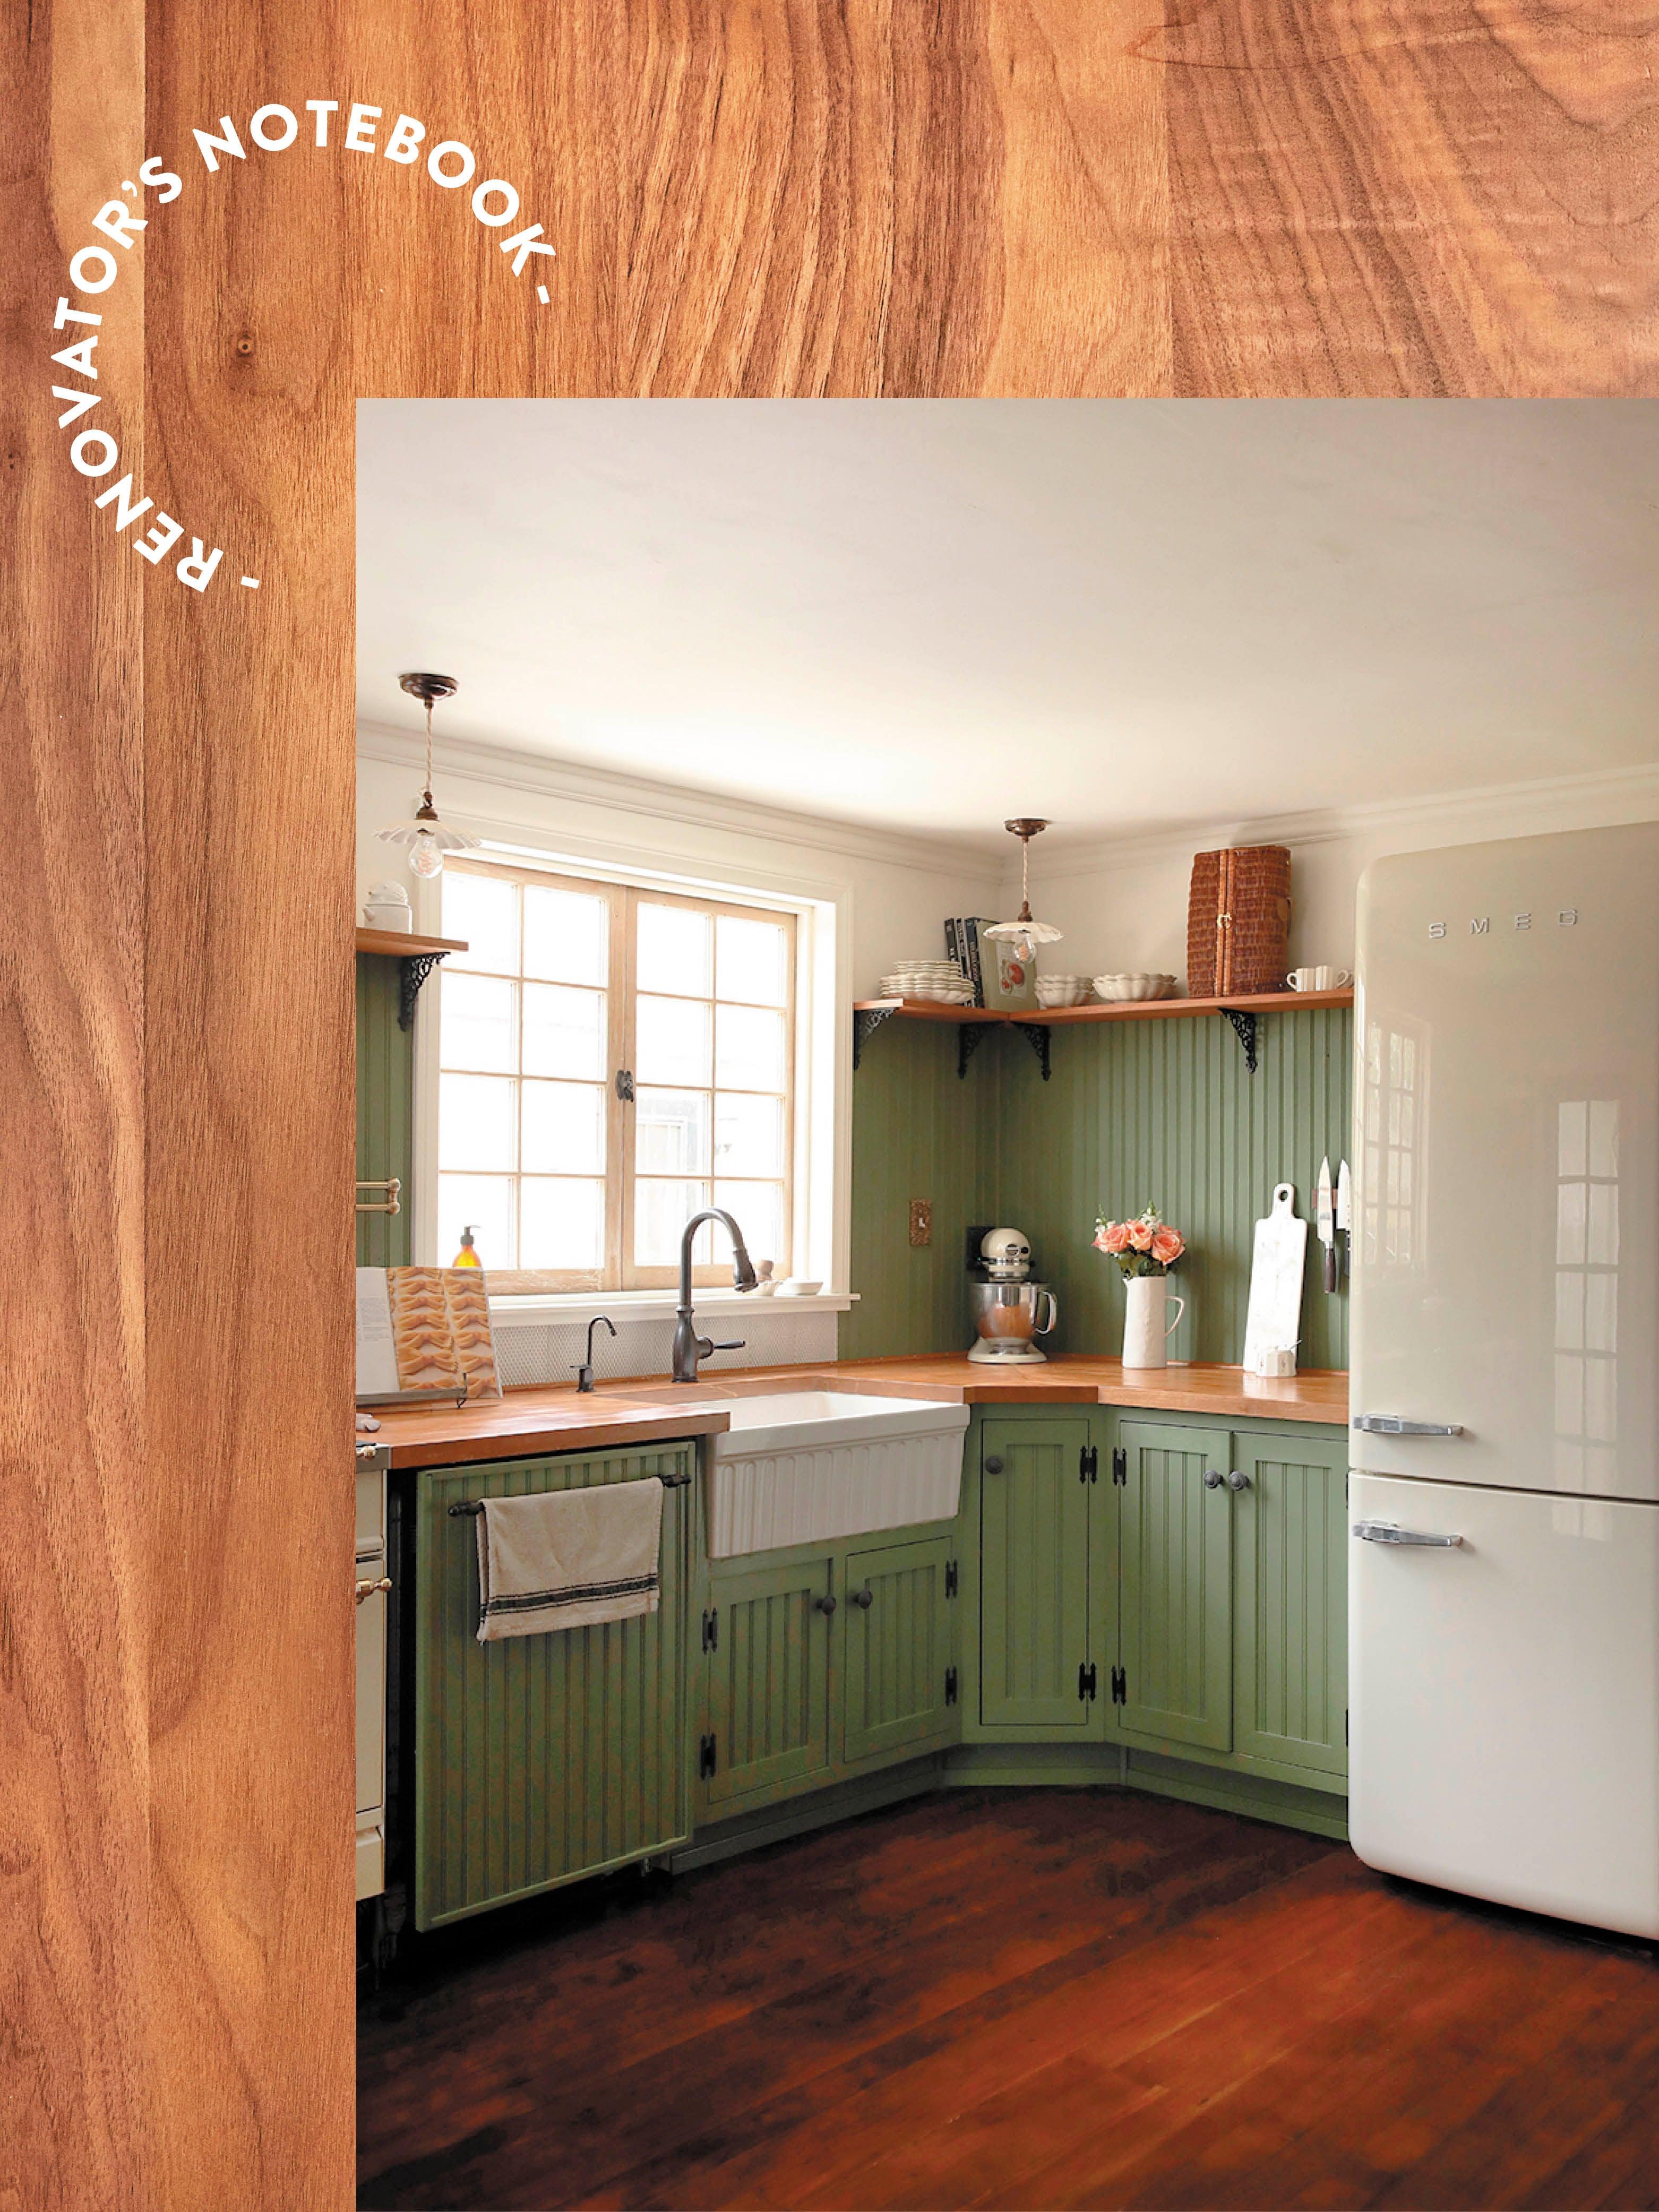 green kitchen on wood background